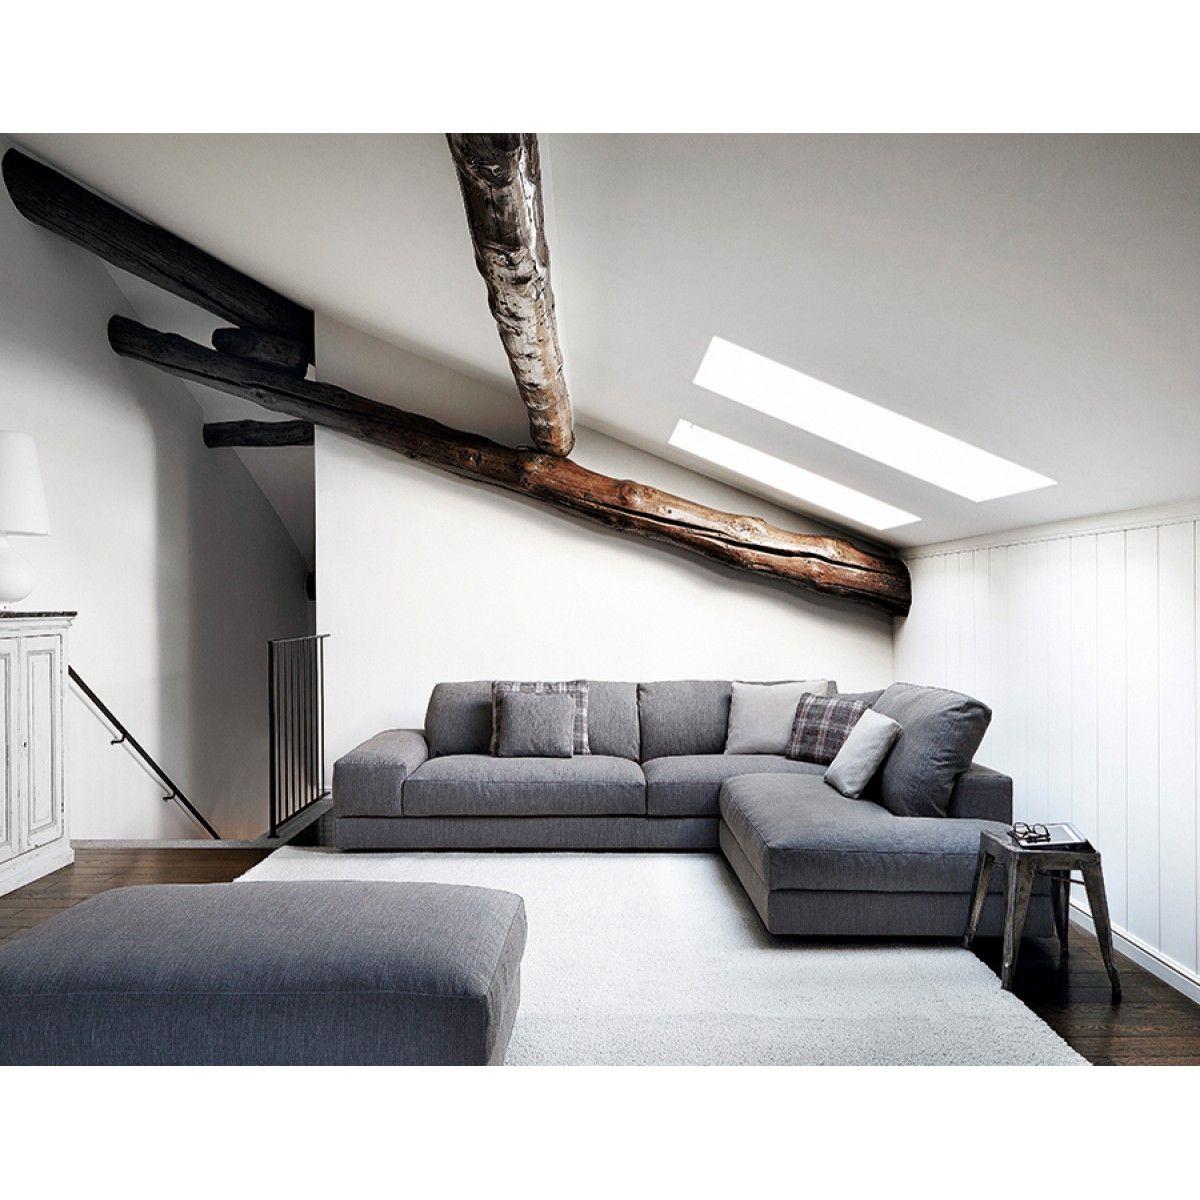 Swan Italia Hamlet Sofa   Very Flexible And Modern Modular Sofa Range,  Which Has Ingenious